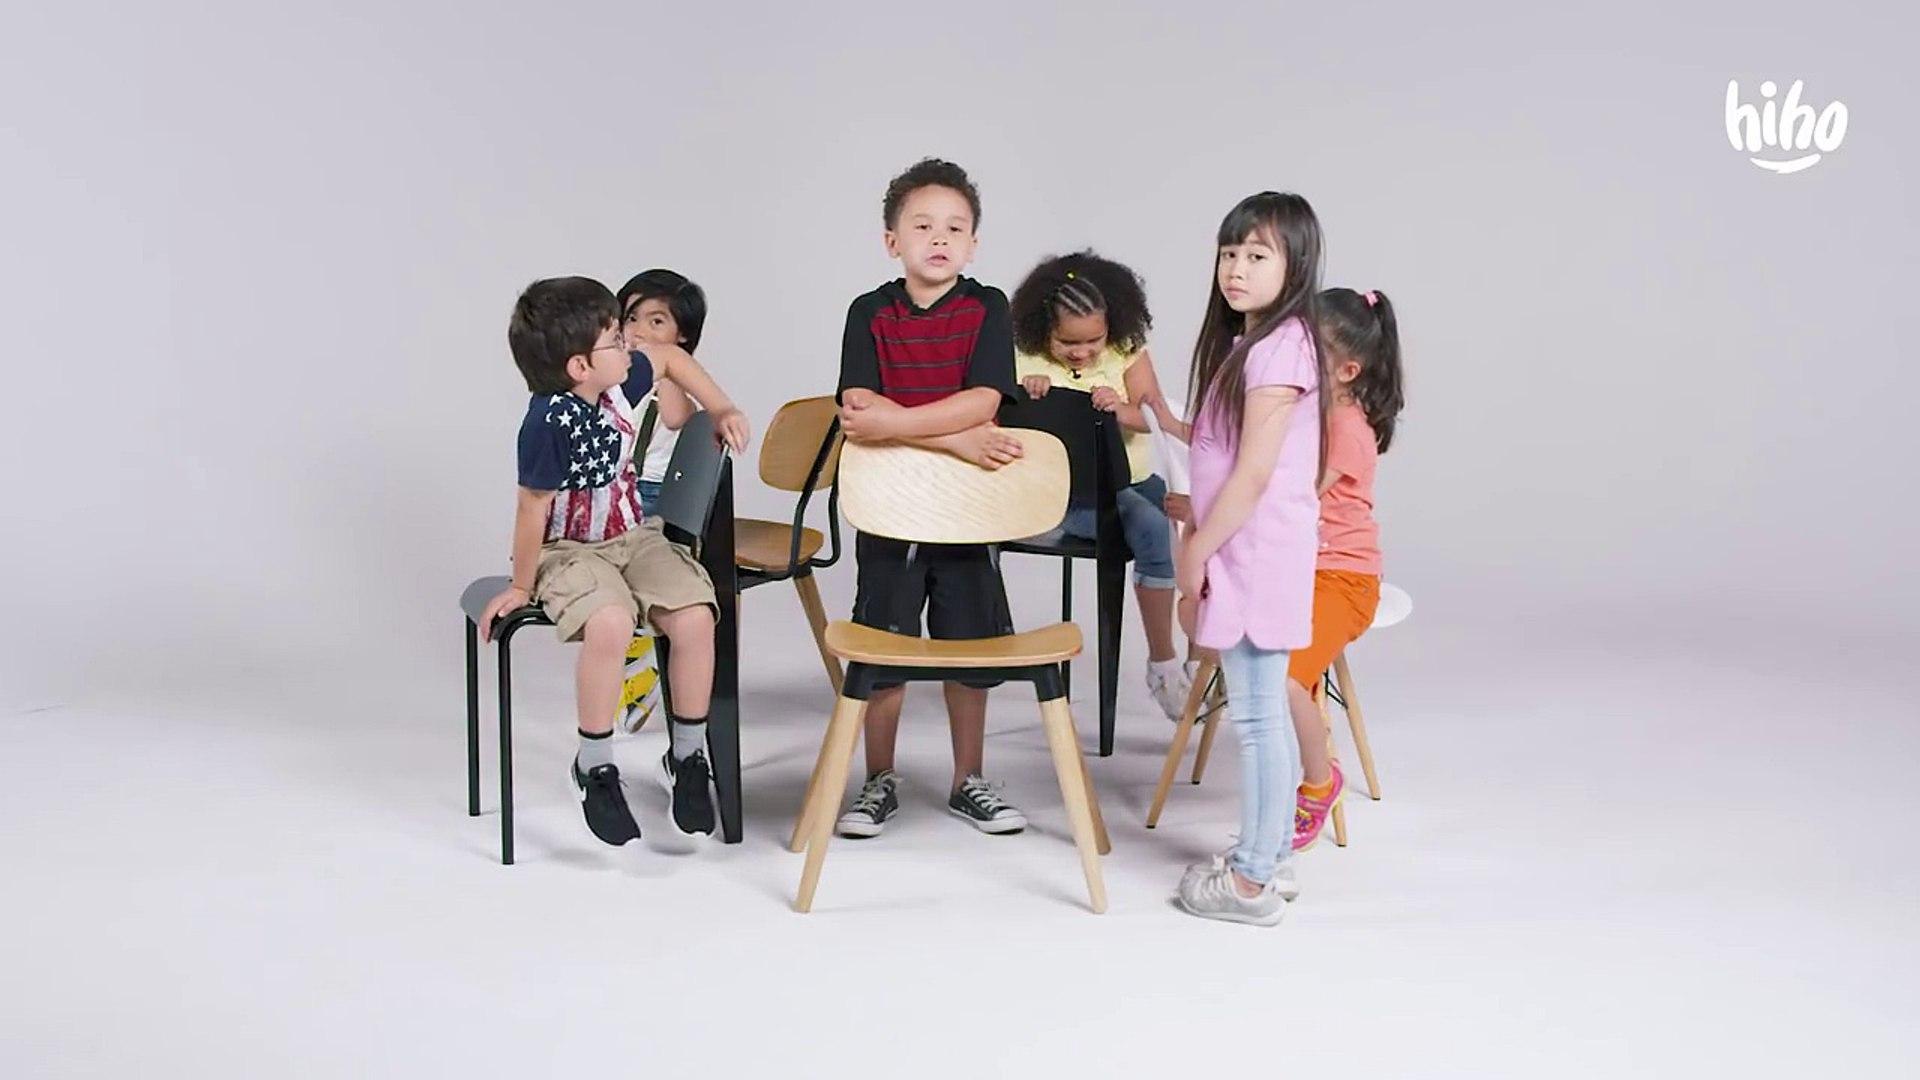 Kids Play Musical Chairs-buX3i3EJIXU